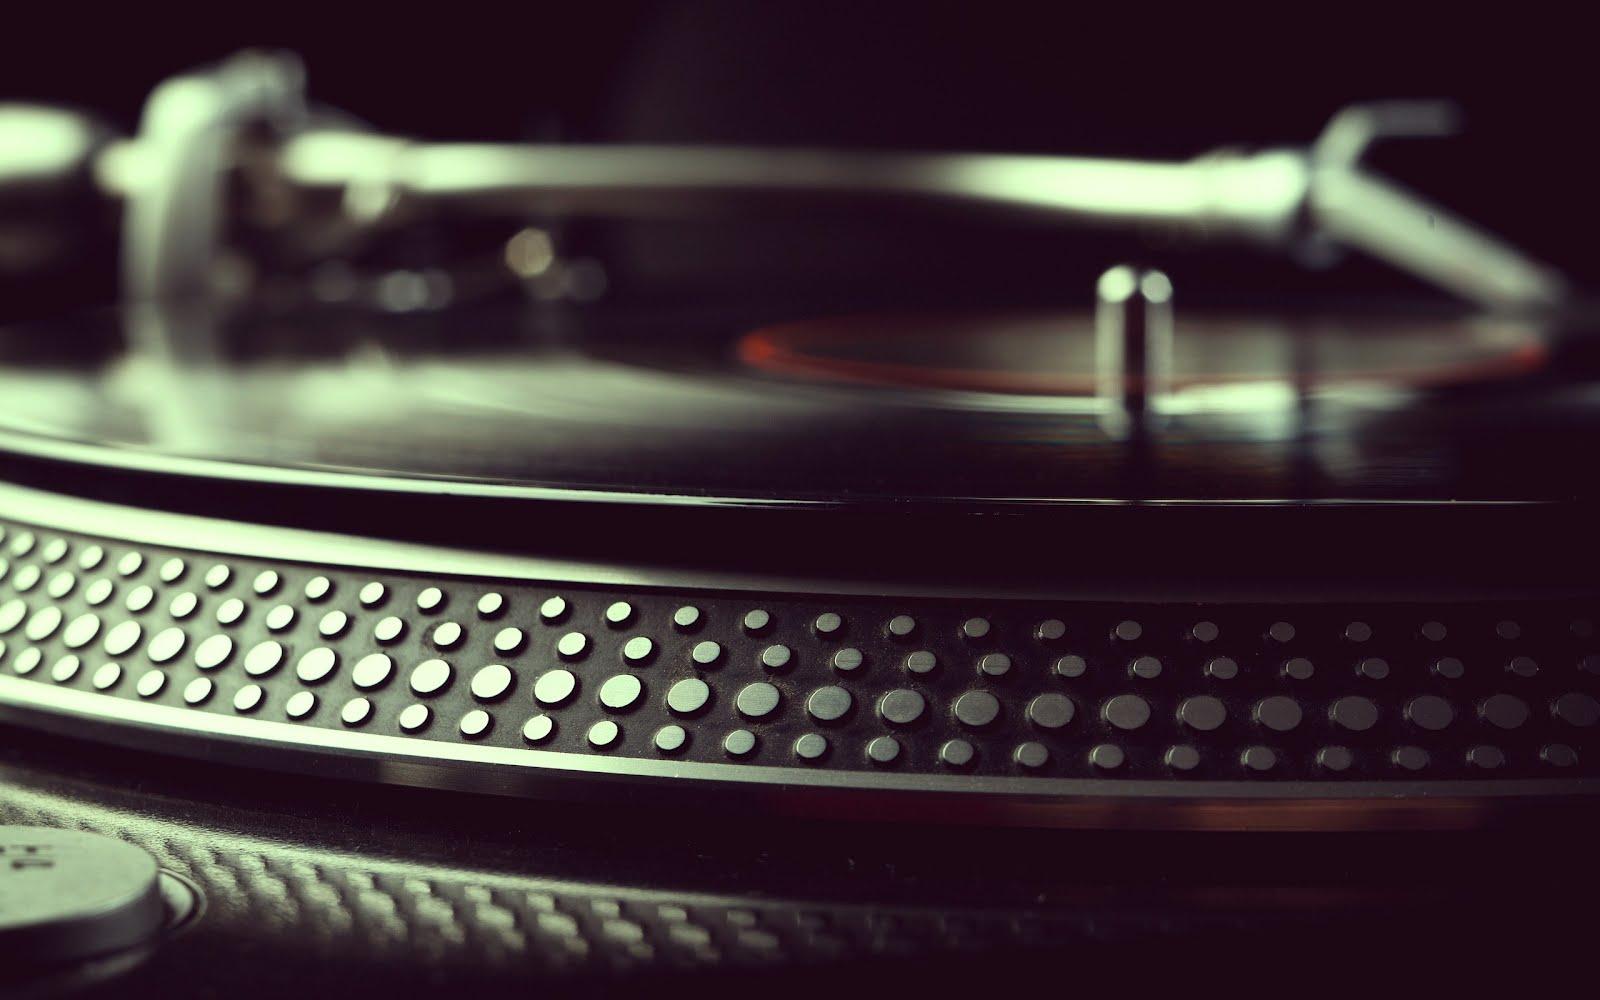 http://2.bp.blogspot.com/-f6zy5LUl8A8/T4P3RK4UV3I/AAAAAAAAGGA/v3BmsFJbxzE/s1600/turntable-record-vinyl-music-wallpaper-2560x1600.jpg